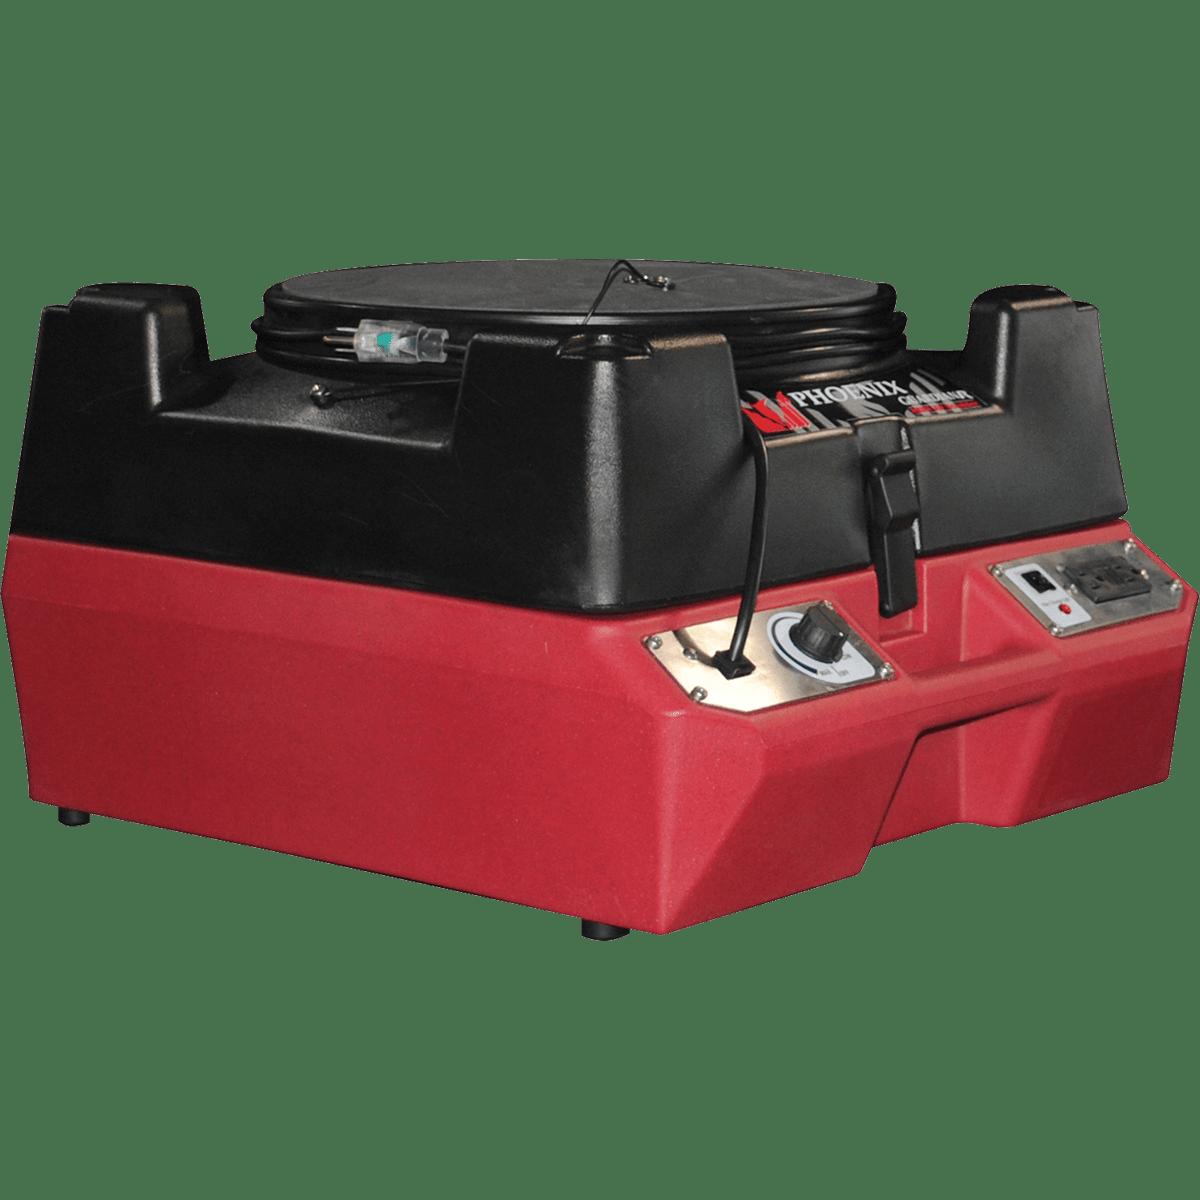 Phoenix GuardianR Pro 500 CFM HEPA Air Scrubber System ph5498